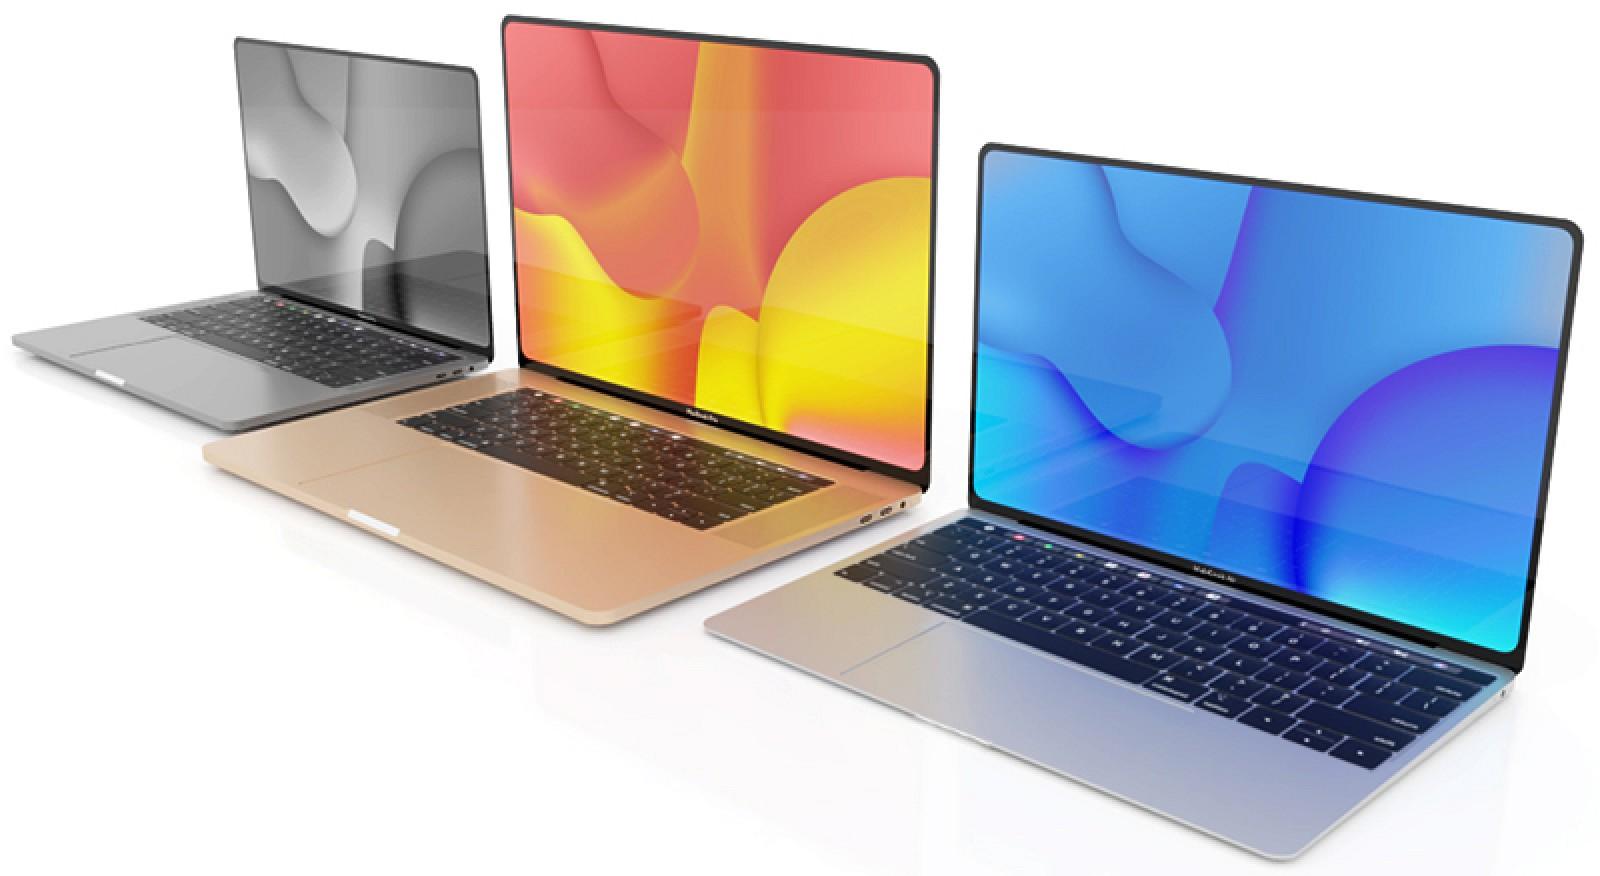 https://cdn.macrumors.com/article-new/2019/07/13-16-inch-macbook-pro-air-trio.jpg?retina